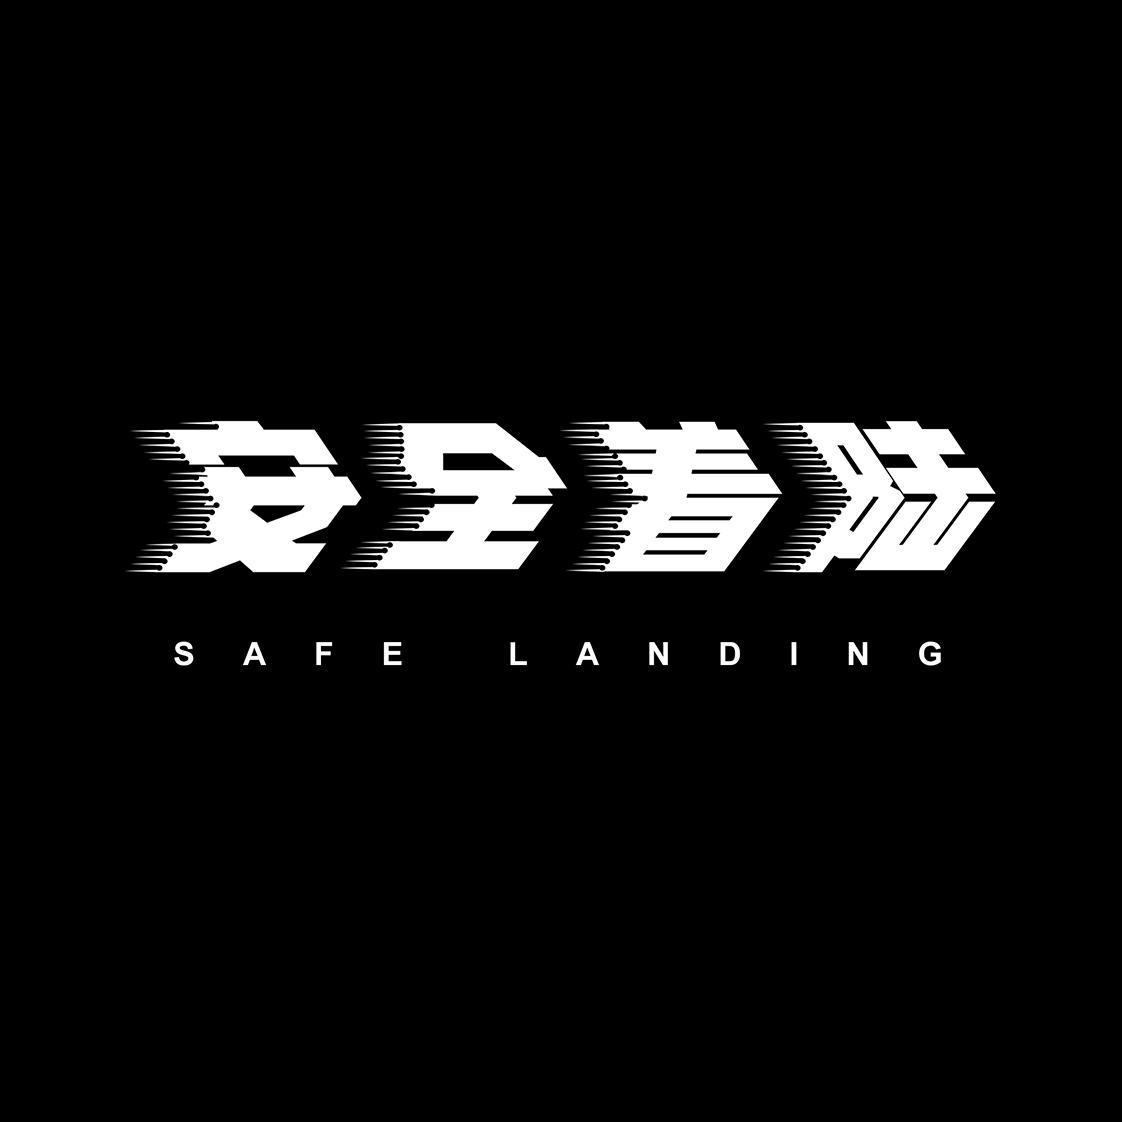 安全着陆 SAFE LANDING